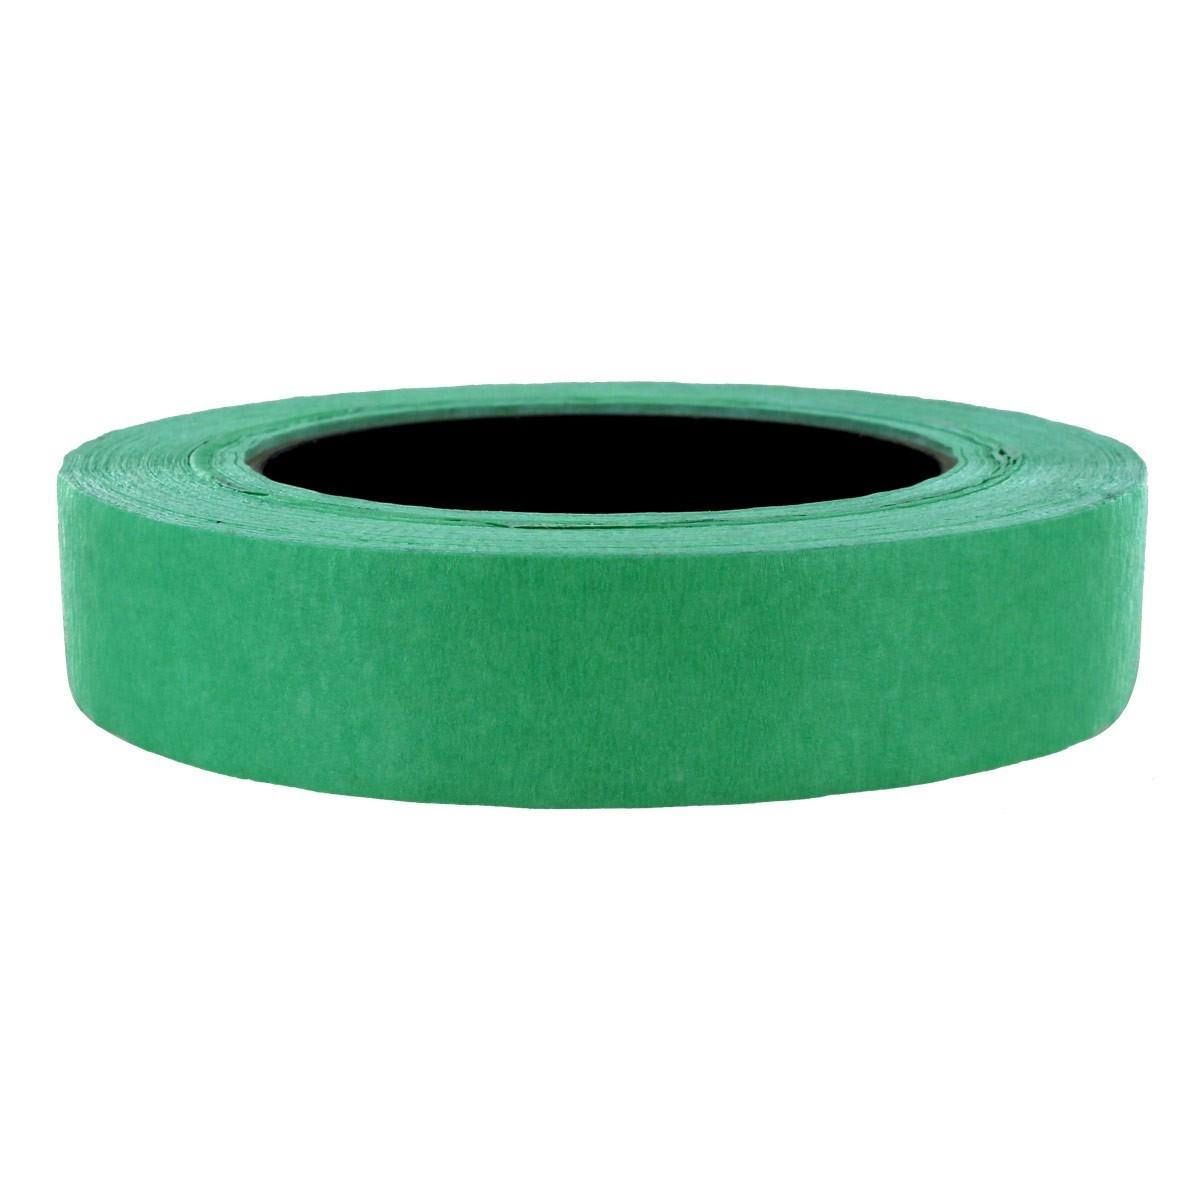 Masking Painters Tape, Green, 18 mm x 55m, 48/cs